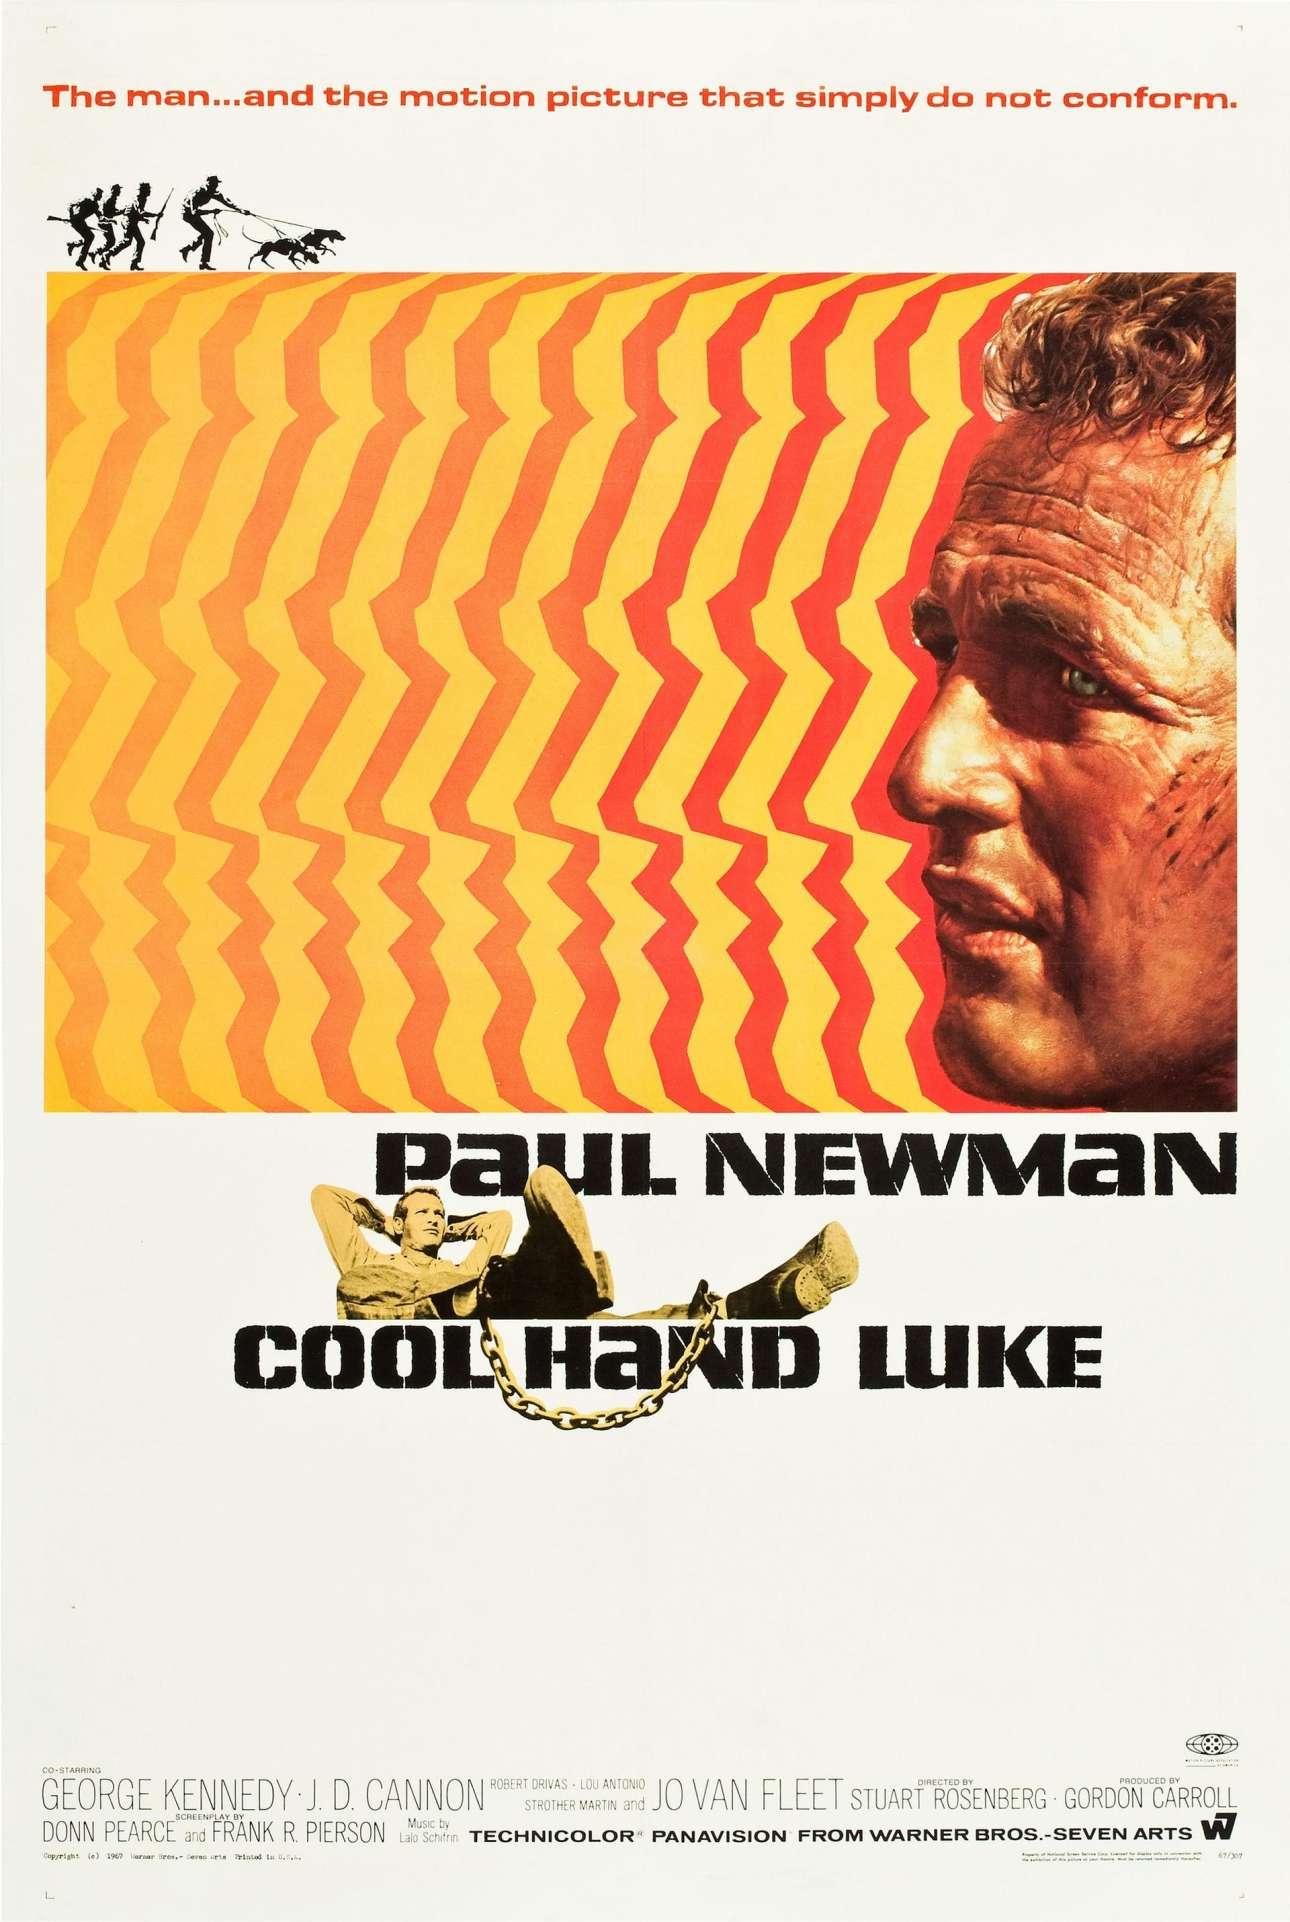 «Cool Hand Luke», 1967. «Οι εικονογραφήσεις αφισών έχουν τελειώσει. Τώρα χρησιμοποιούν μόνο ψηφιακές φωτογραφίες. Οποιος μπορεί να χρησιμοποιήσει έναν υπολογιστή πιστεύει ότι μπορεί να το κάνει. Η γνώση του υπολογιστή είναι πολύ διαφορετική από το να είσαι καλλιτέχνης ή καλλιτεχνικός διευθυντής ή μακετίστας»